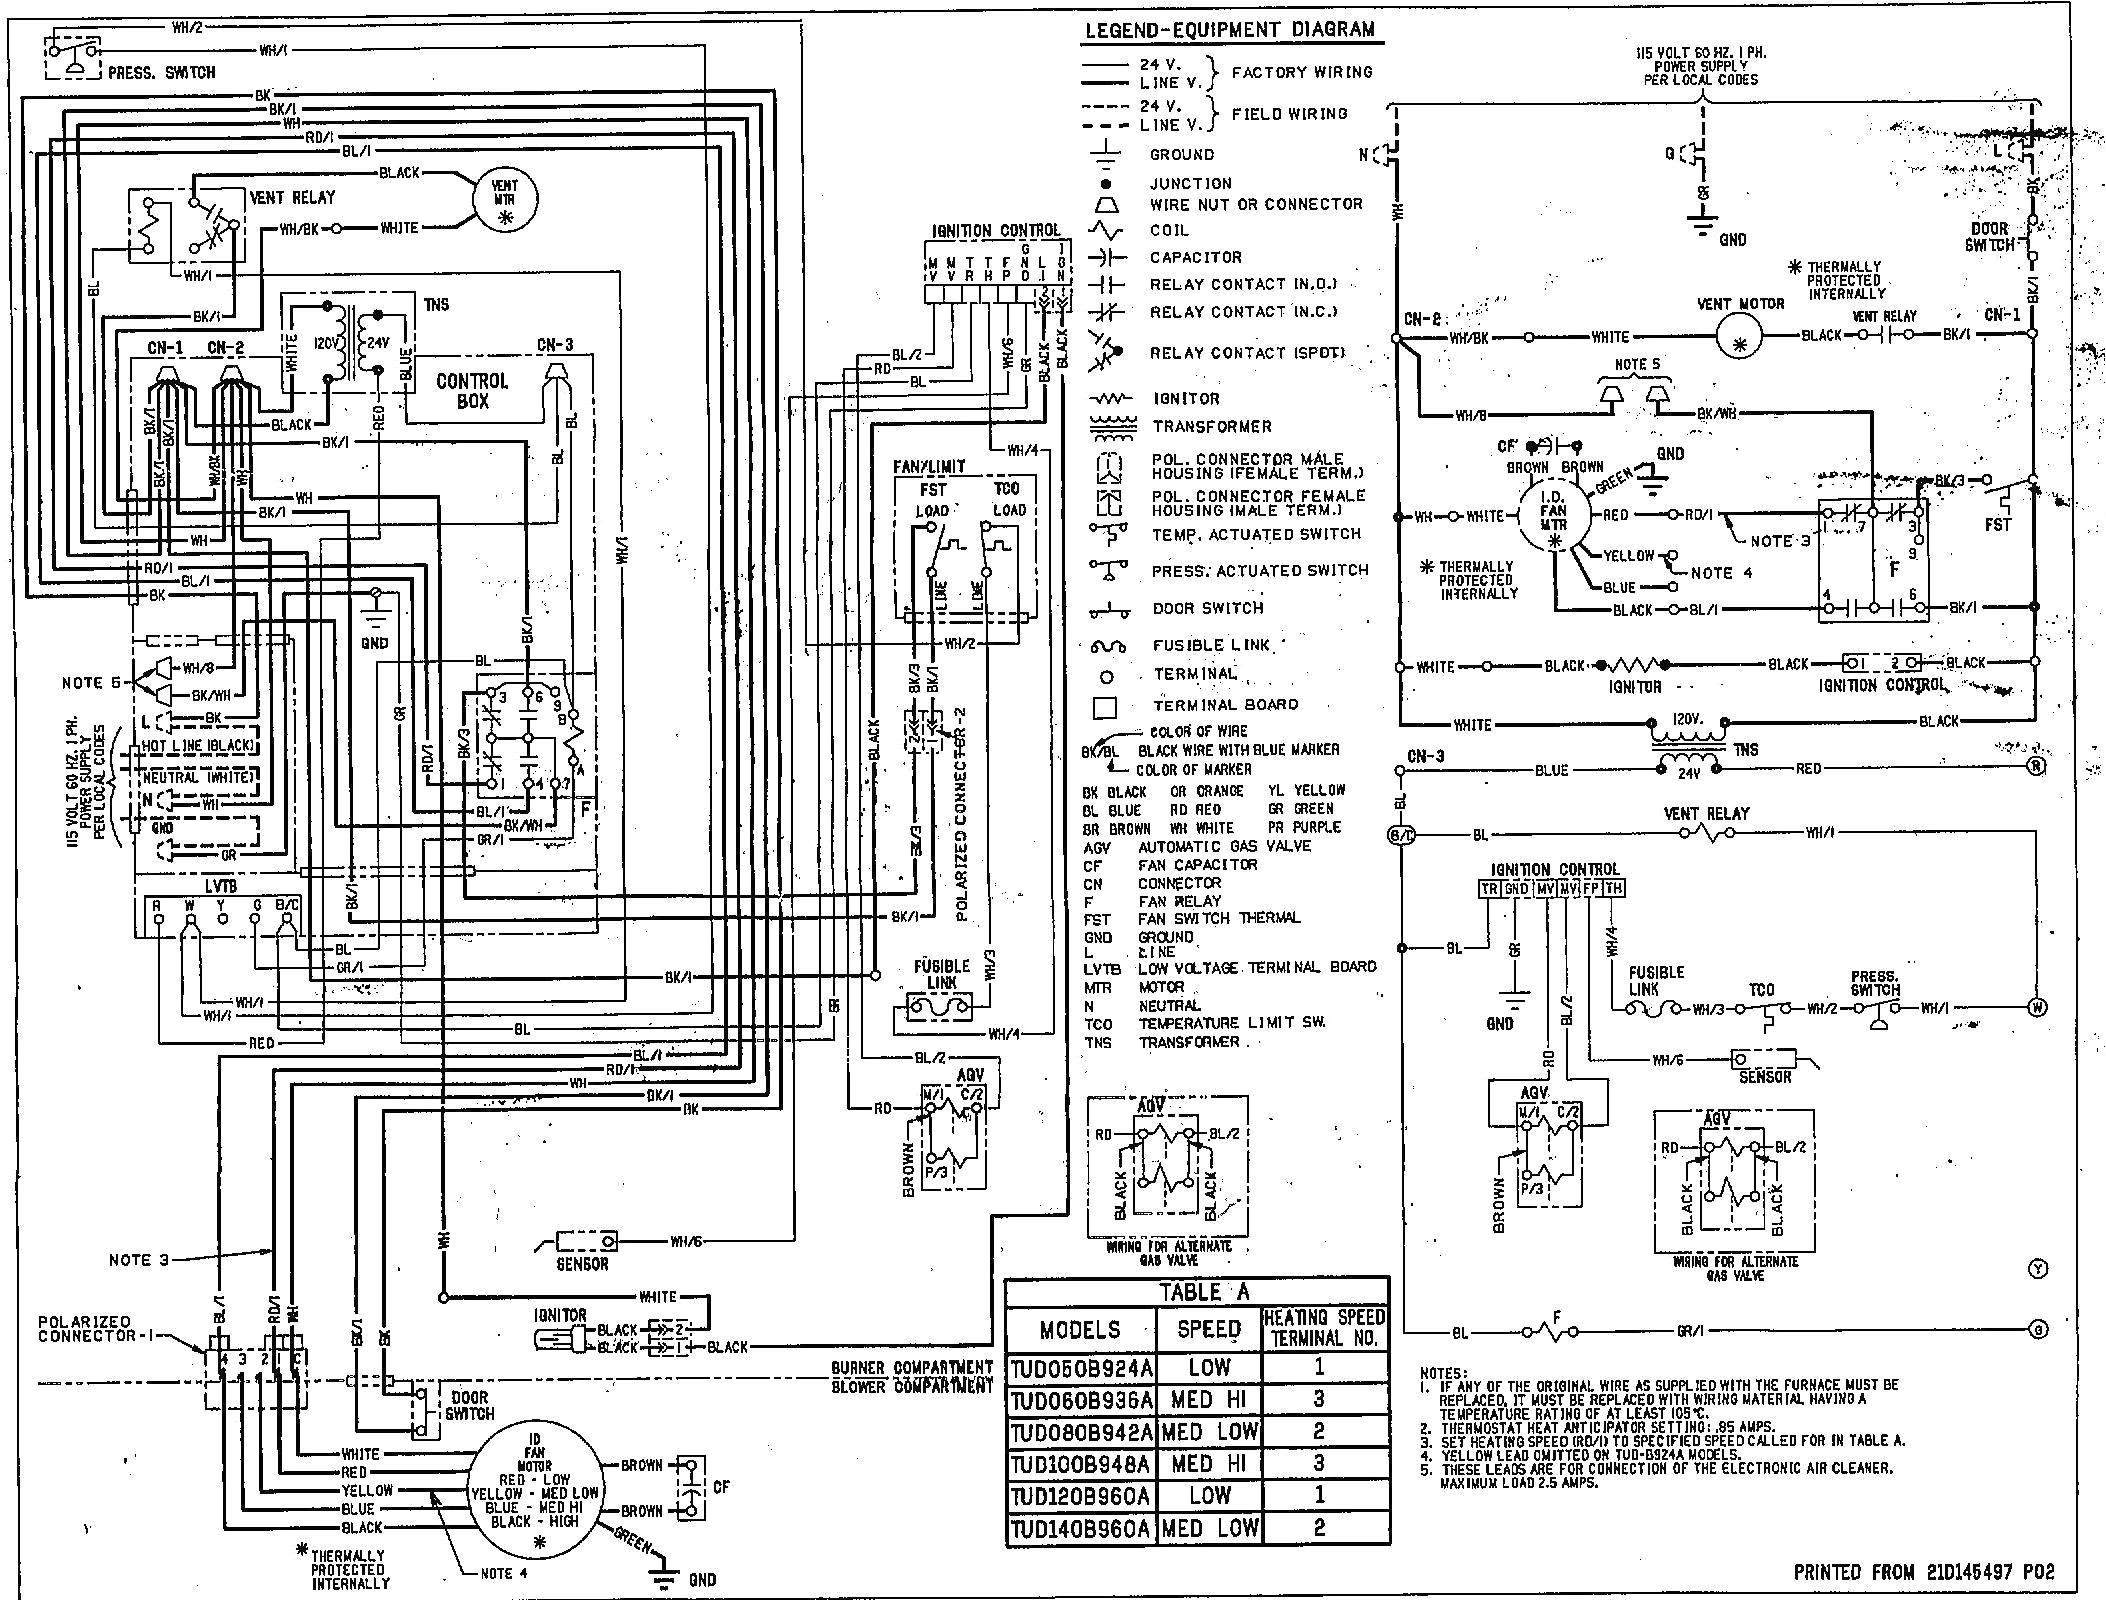 coachmen rv wiring diagrams trusted wiring diagrams u2022 rh 149 28 242 213 alternator wiring diagram